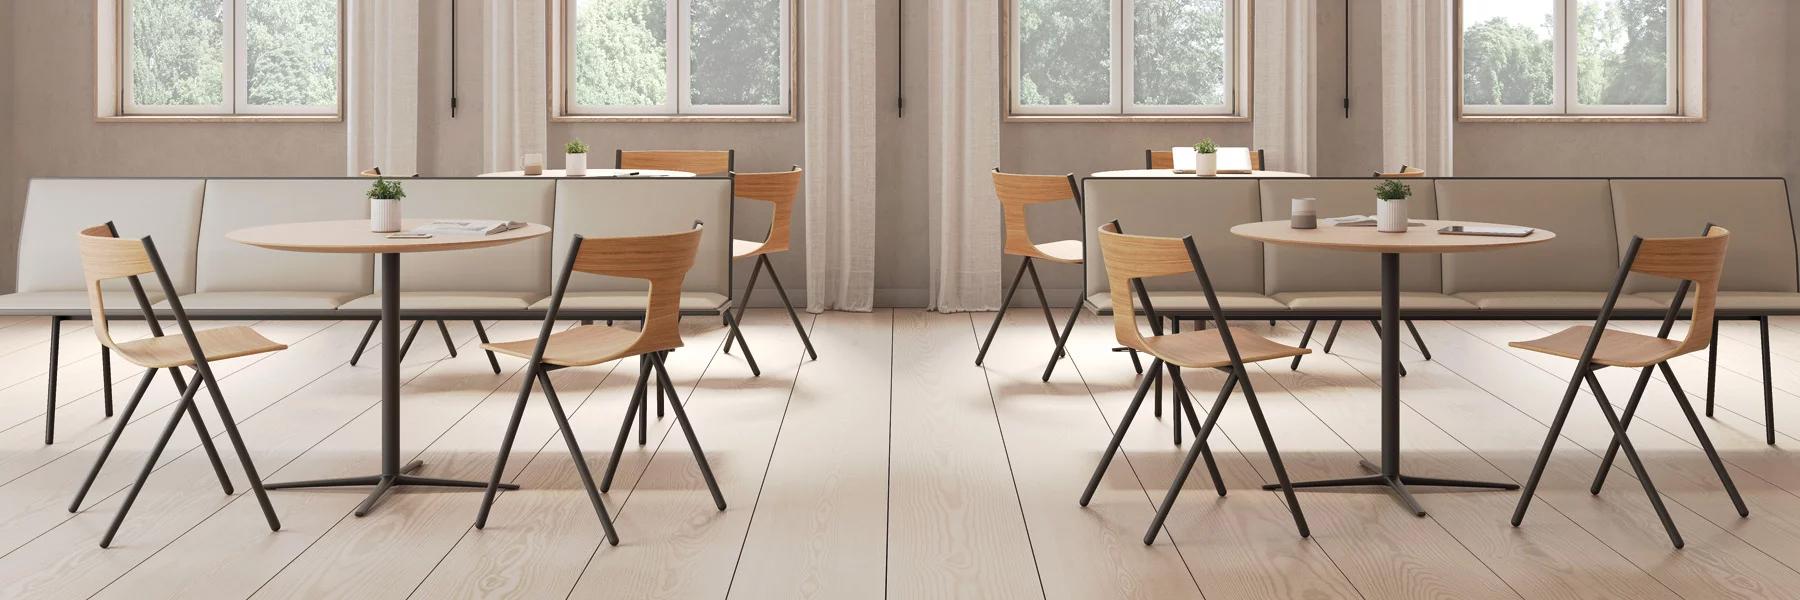 Quadra Chair 7